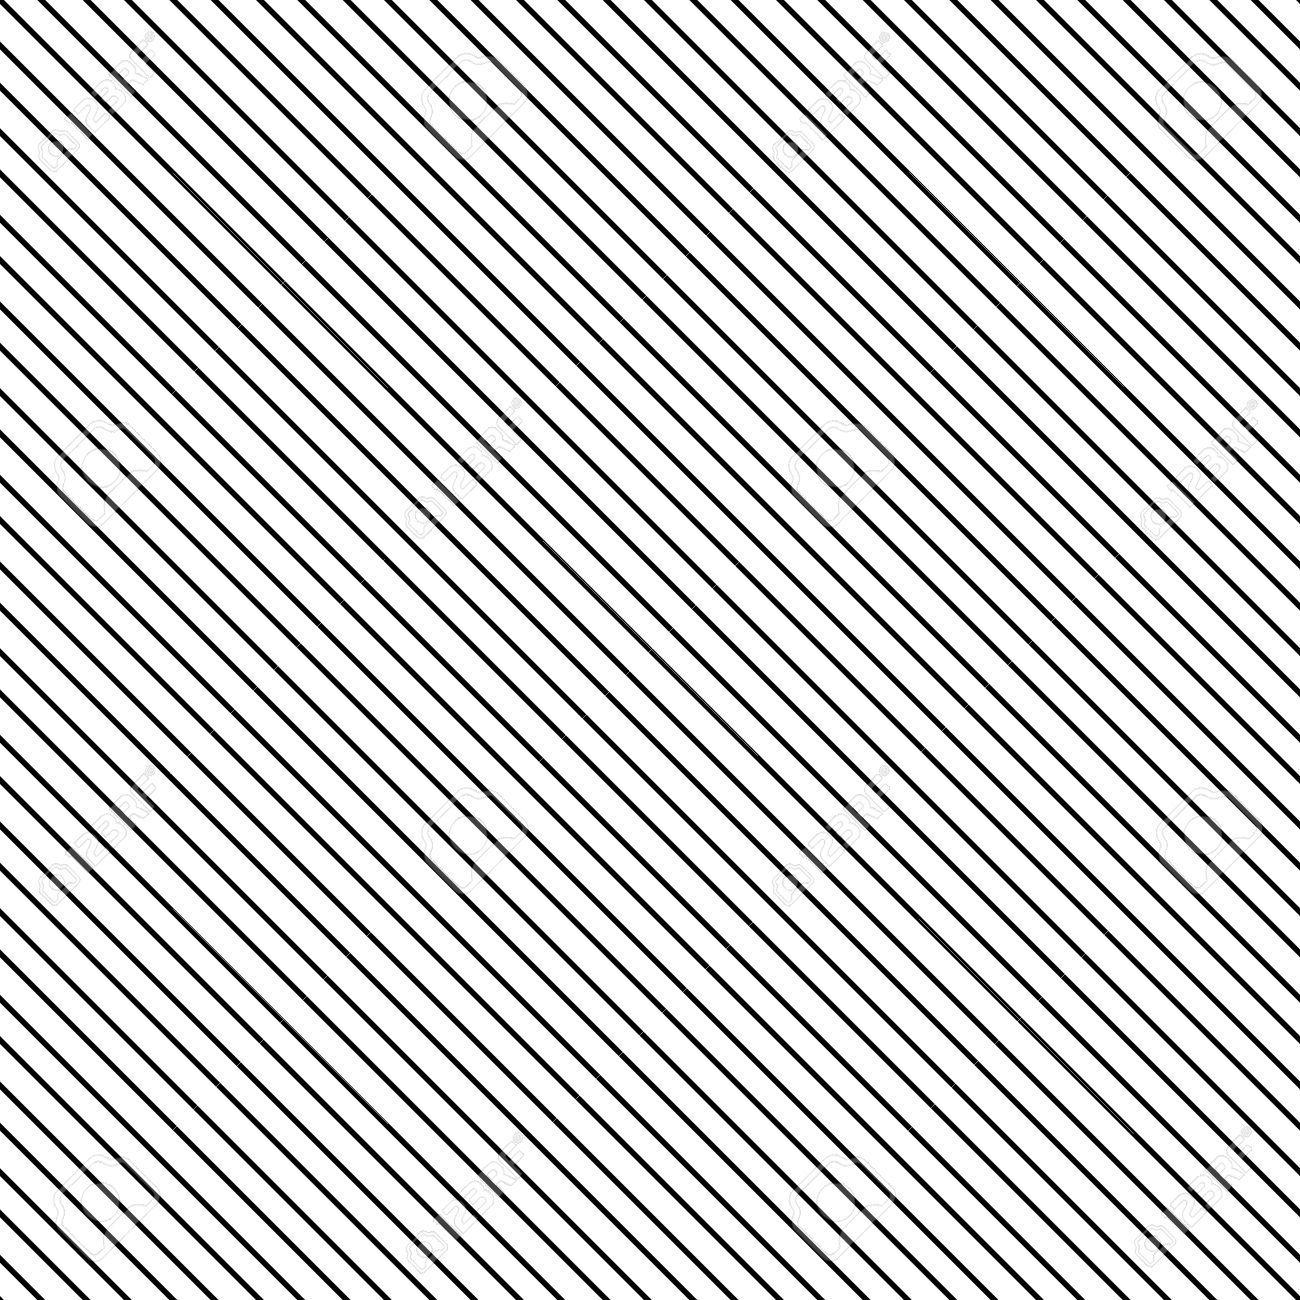 Diagonal Stripe Seamless Pattern Geometric Classic Black And Seamless Patterns Line Background Diagonal Stripes